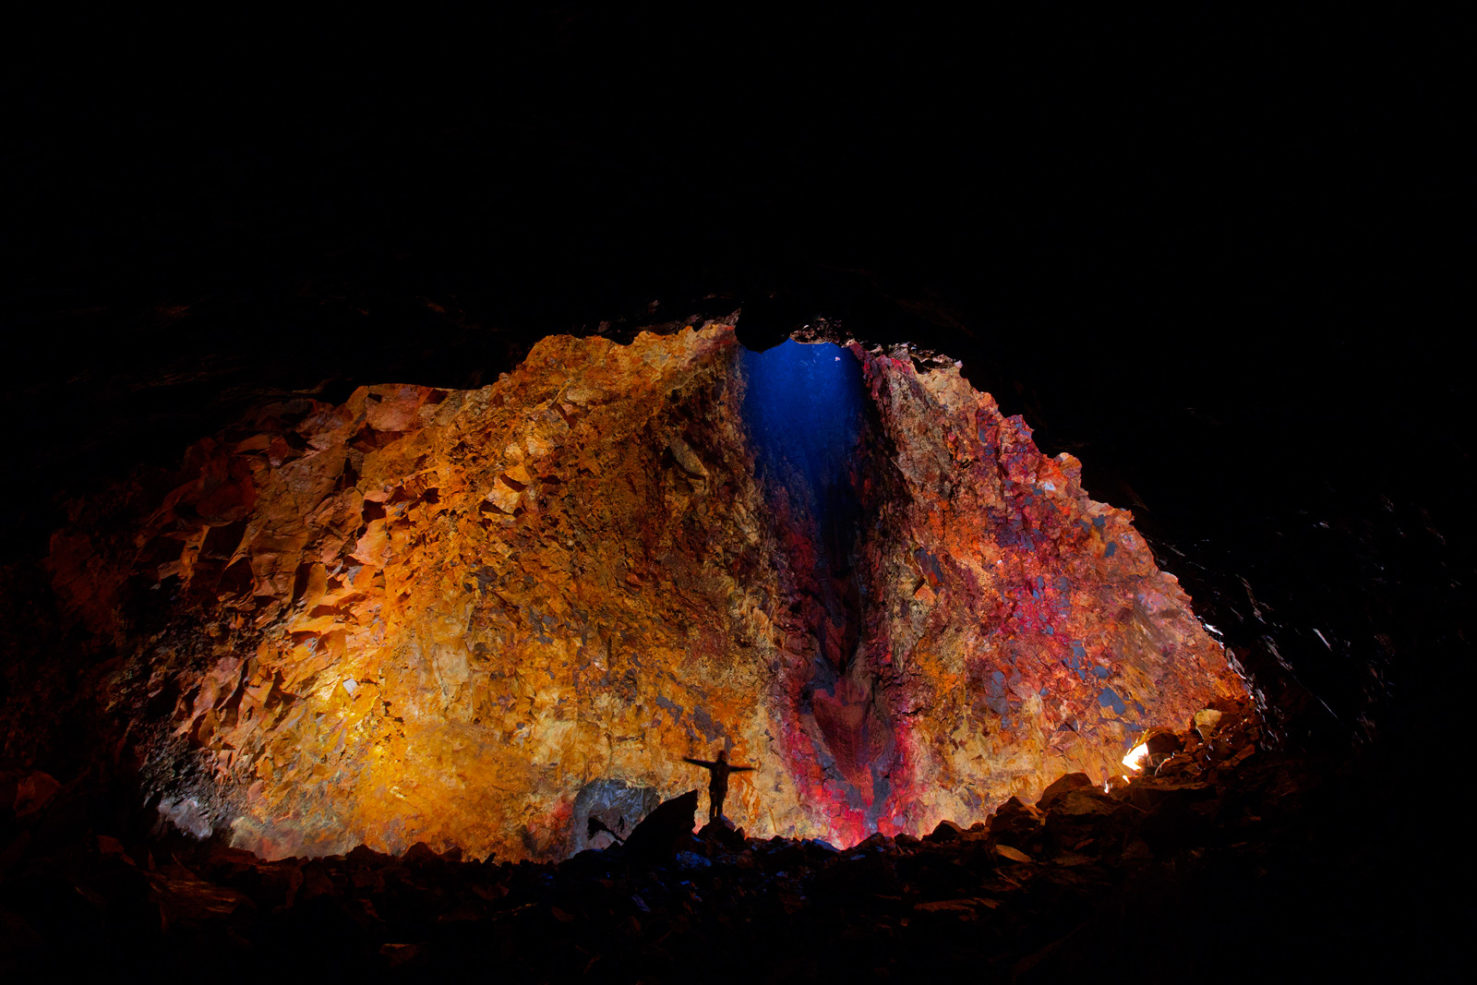 Secret Solstice – Volcán Thrihnukagigur (Reiquiavique, Islândia) de 15 a 18 de junho